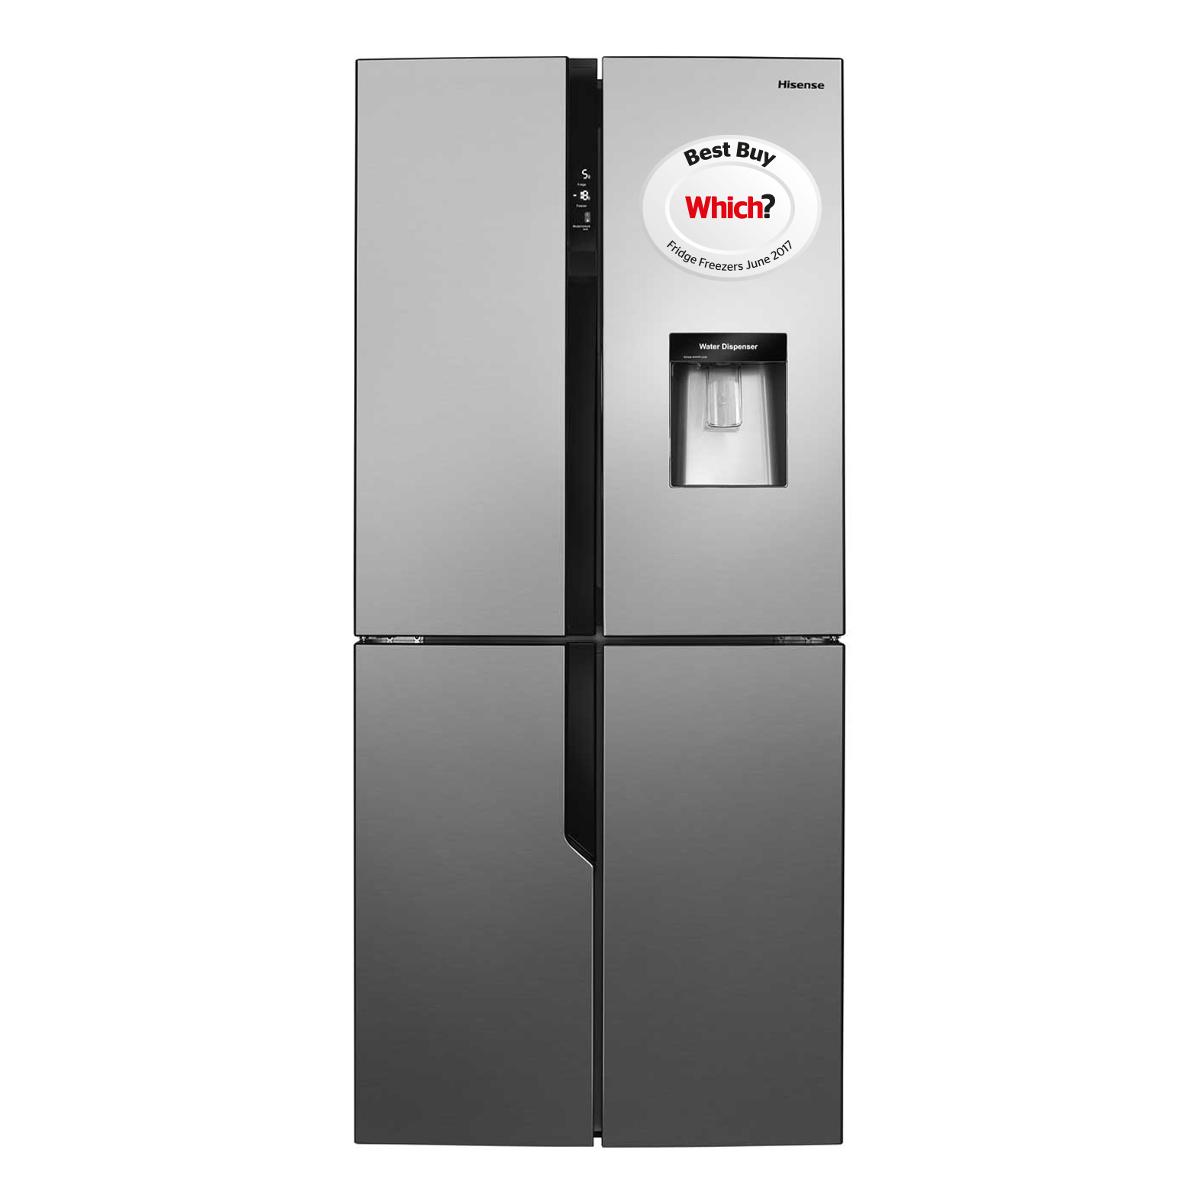 Hisense Rq560n4wc1 American Fridge Freezer Hughes